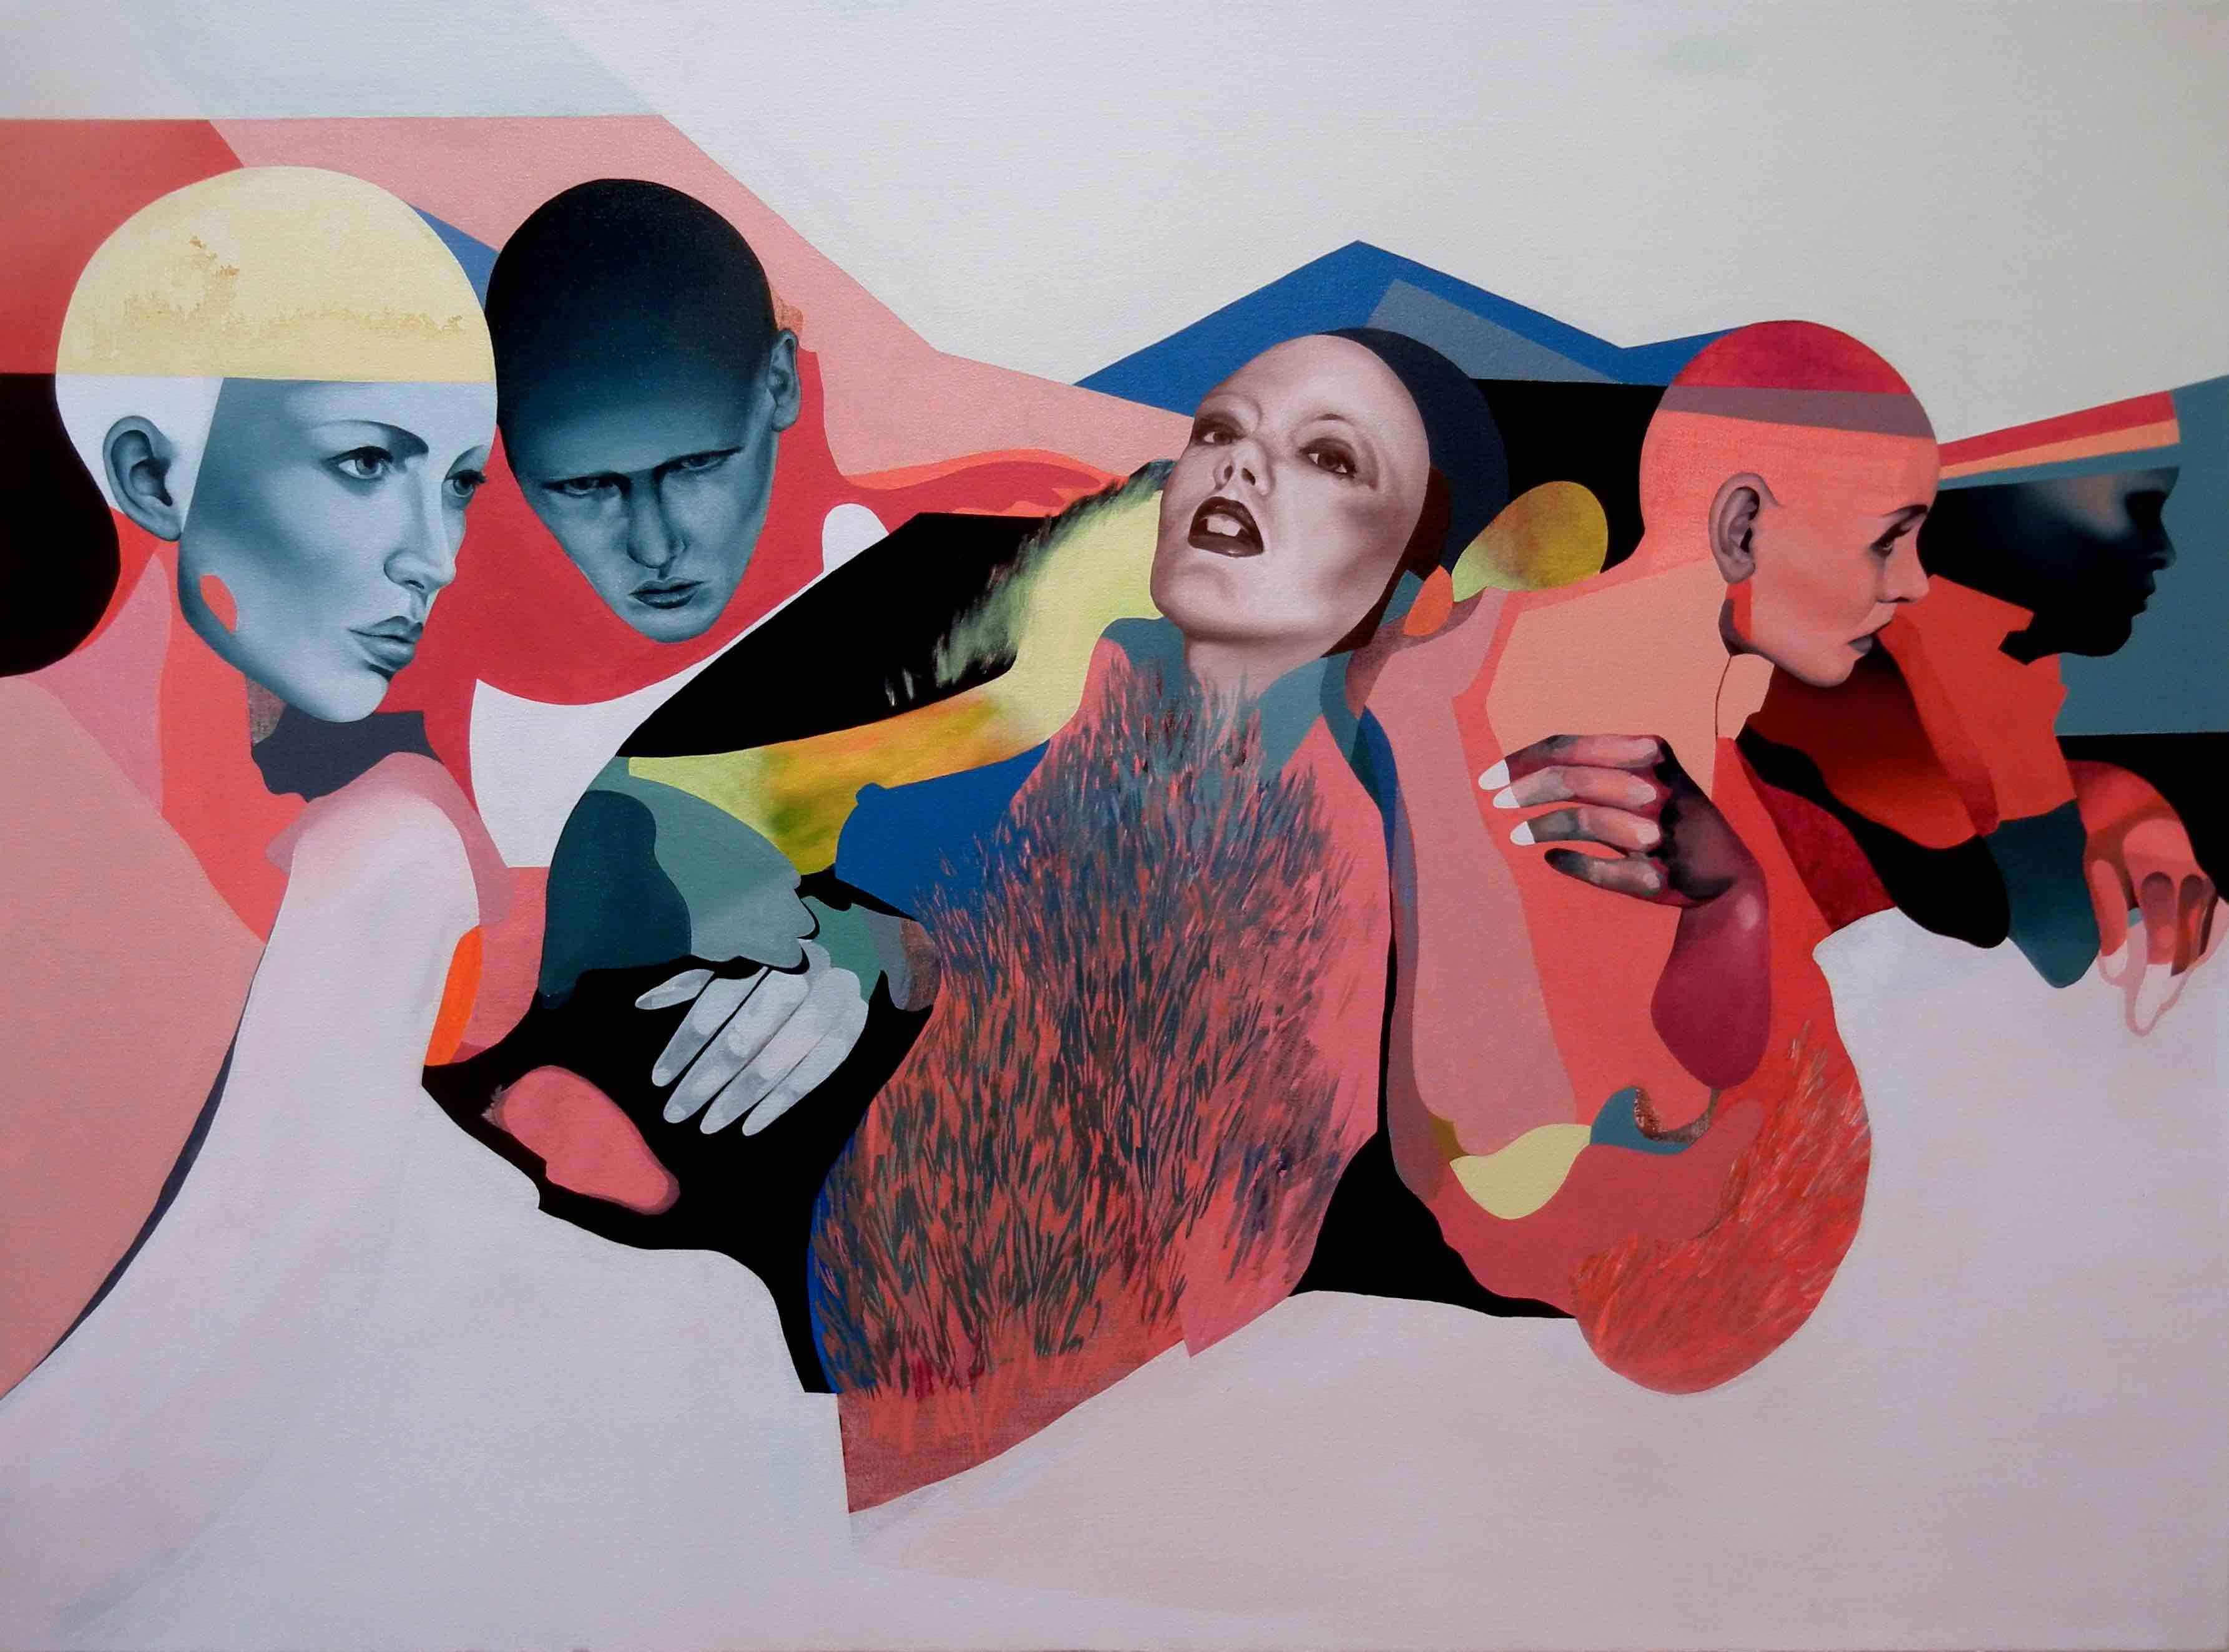 Sounds of Sirens by  Beata Chrzanowska - Masterpiece Online